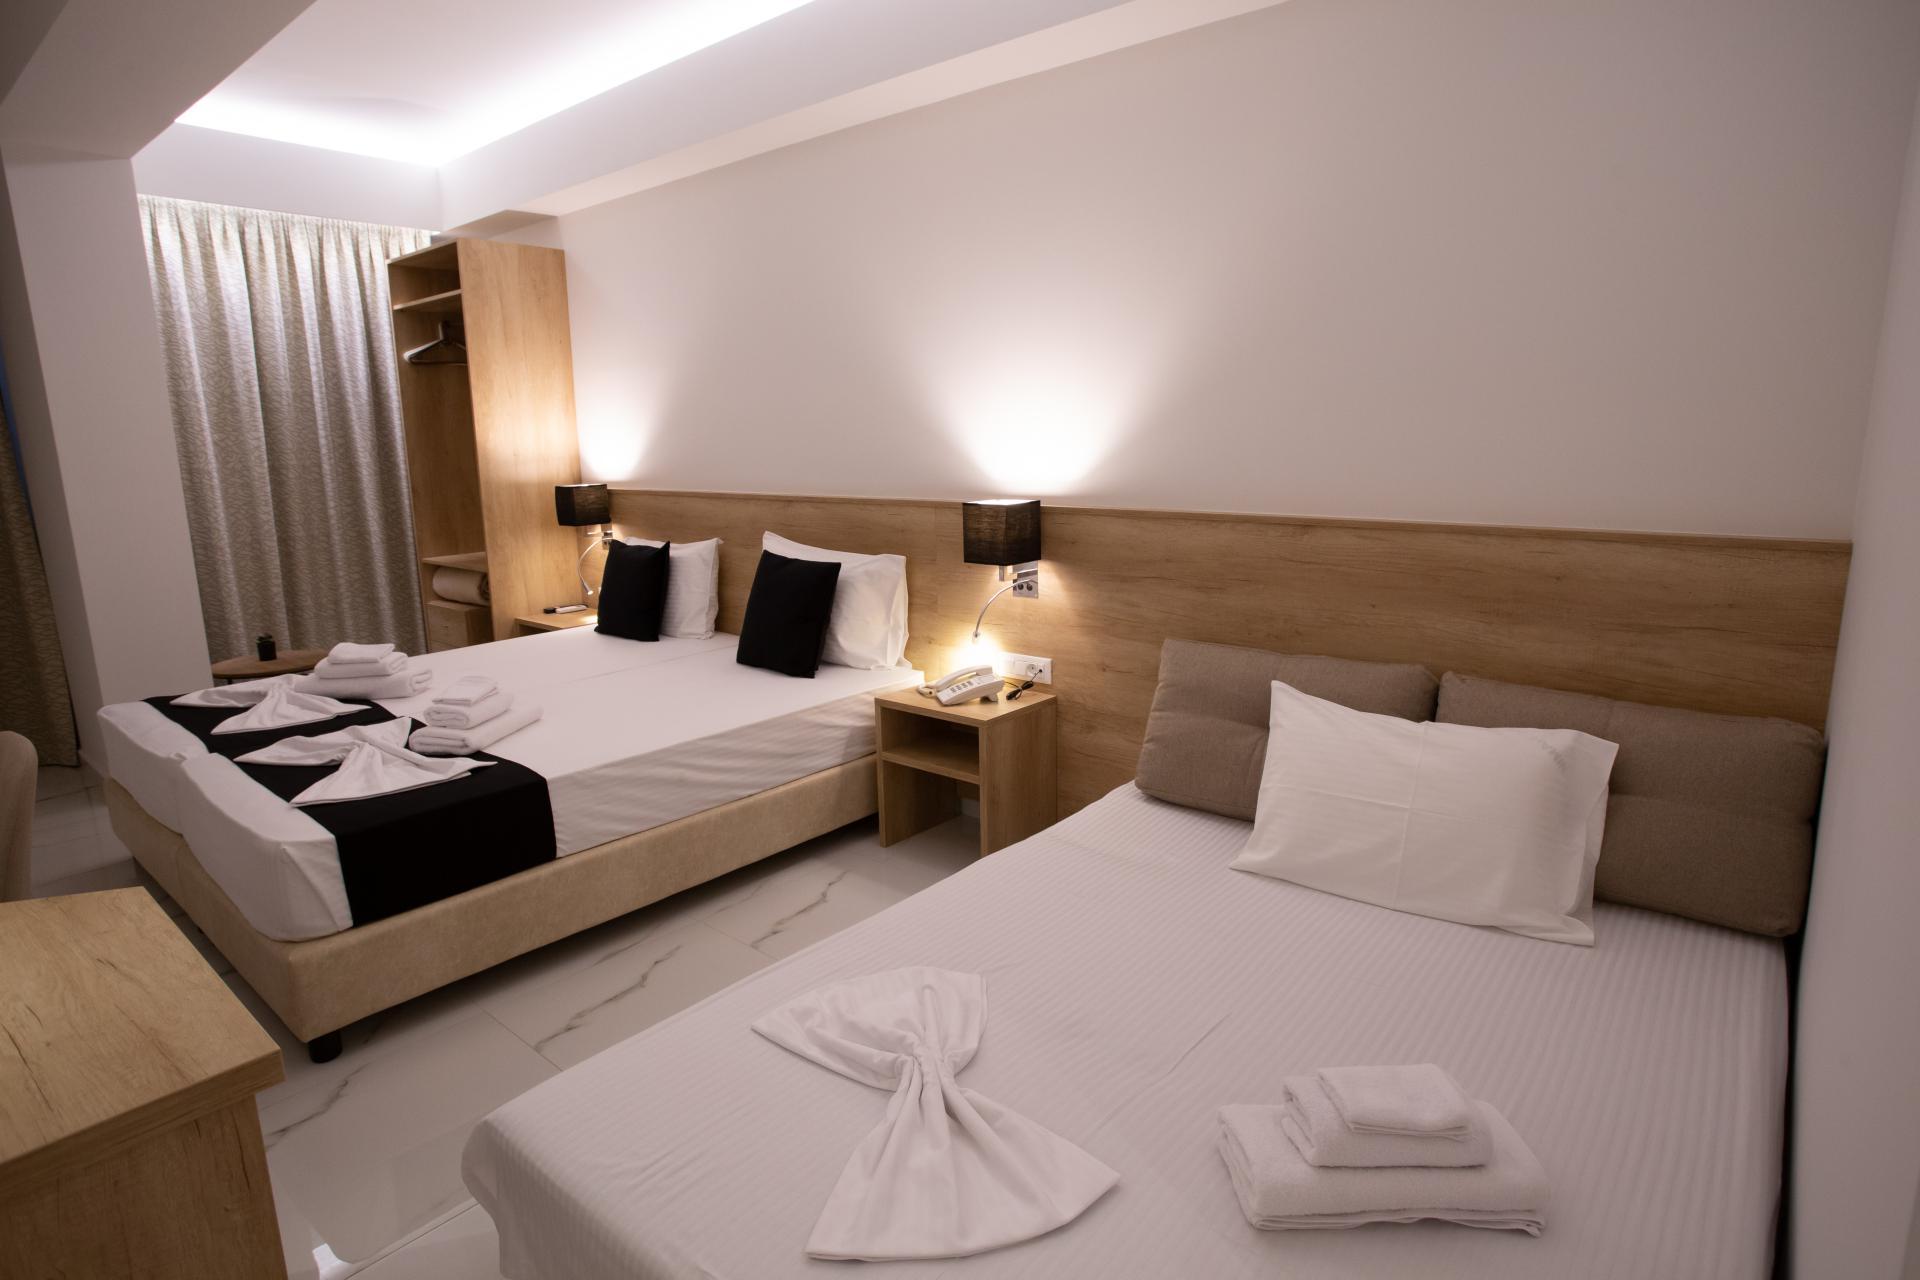 Triple Room 1-Marvel Deluxe Rooms Heraklion Crete